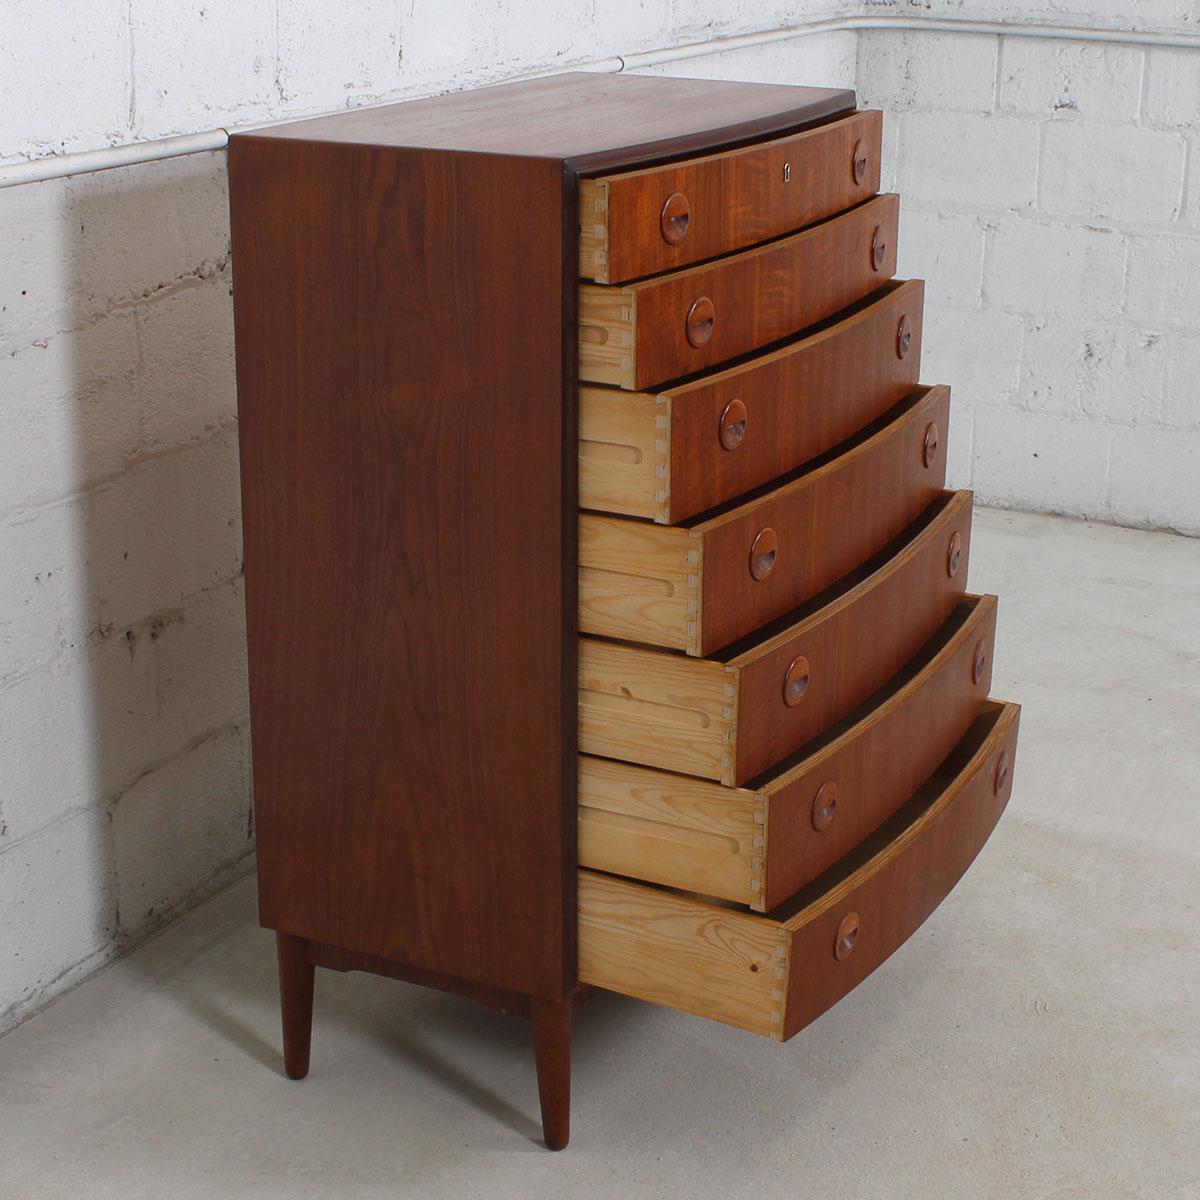 kai kristiansen danish modern bow front highboy dresser - Highboy Dresser